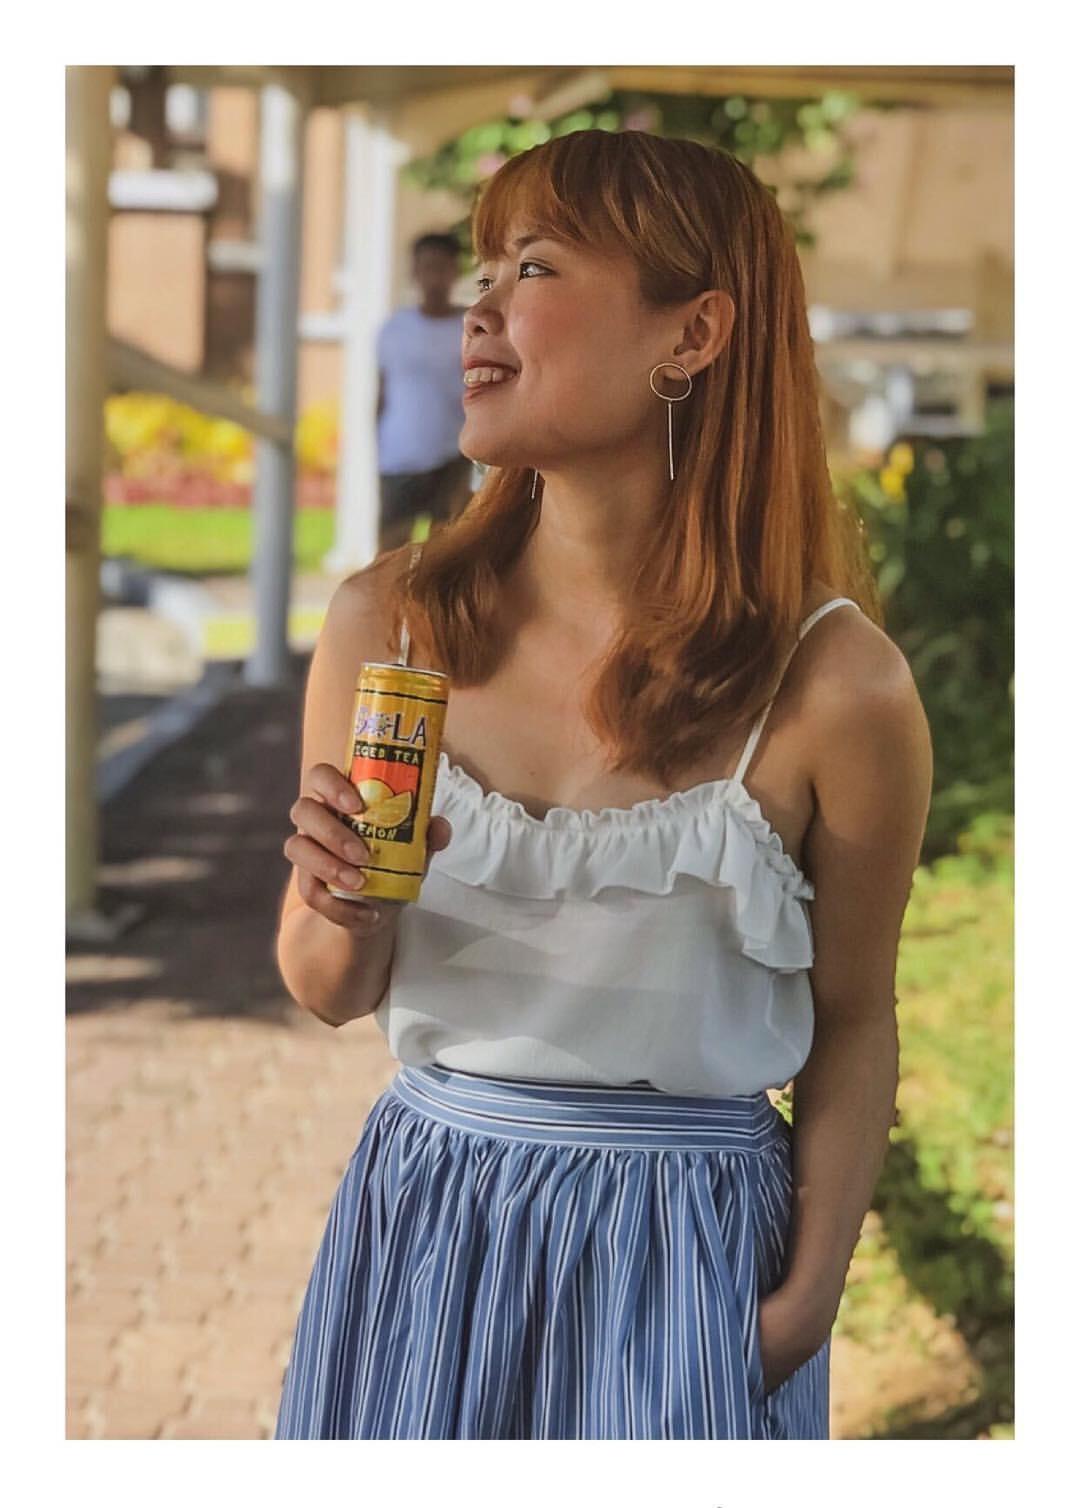 Collaboration with Sola Iced Tea